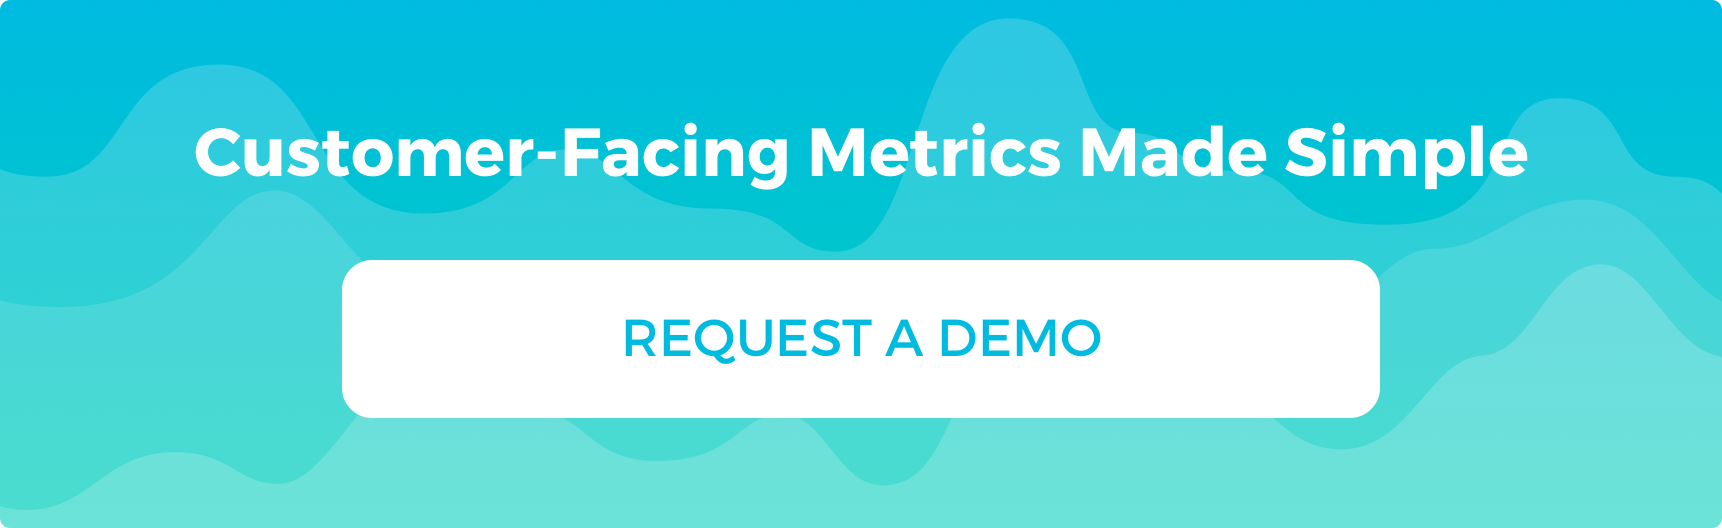 Customer-Facing Metrics Made Simple Request a Demo